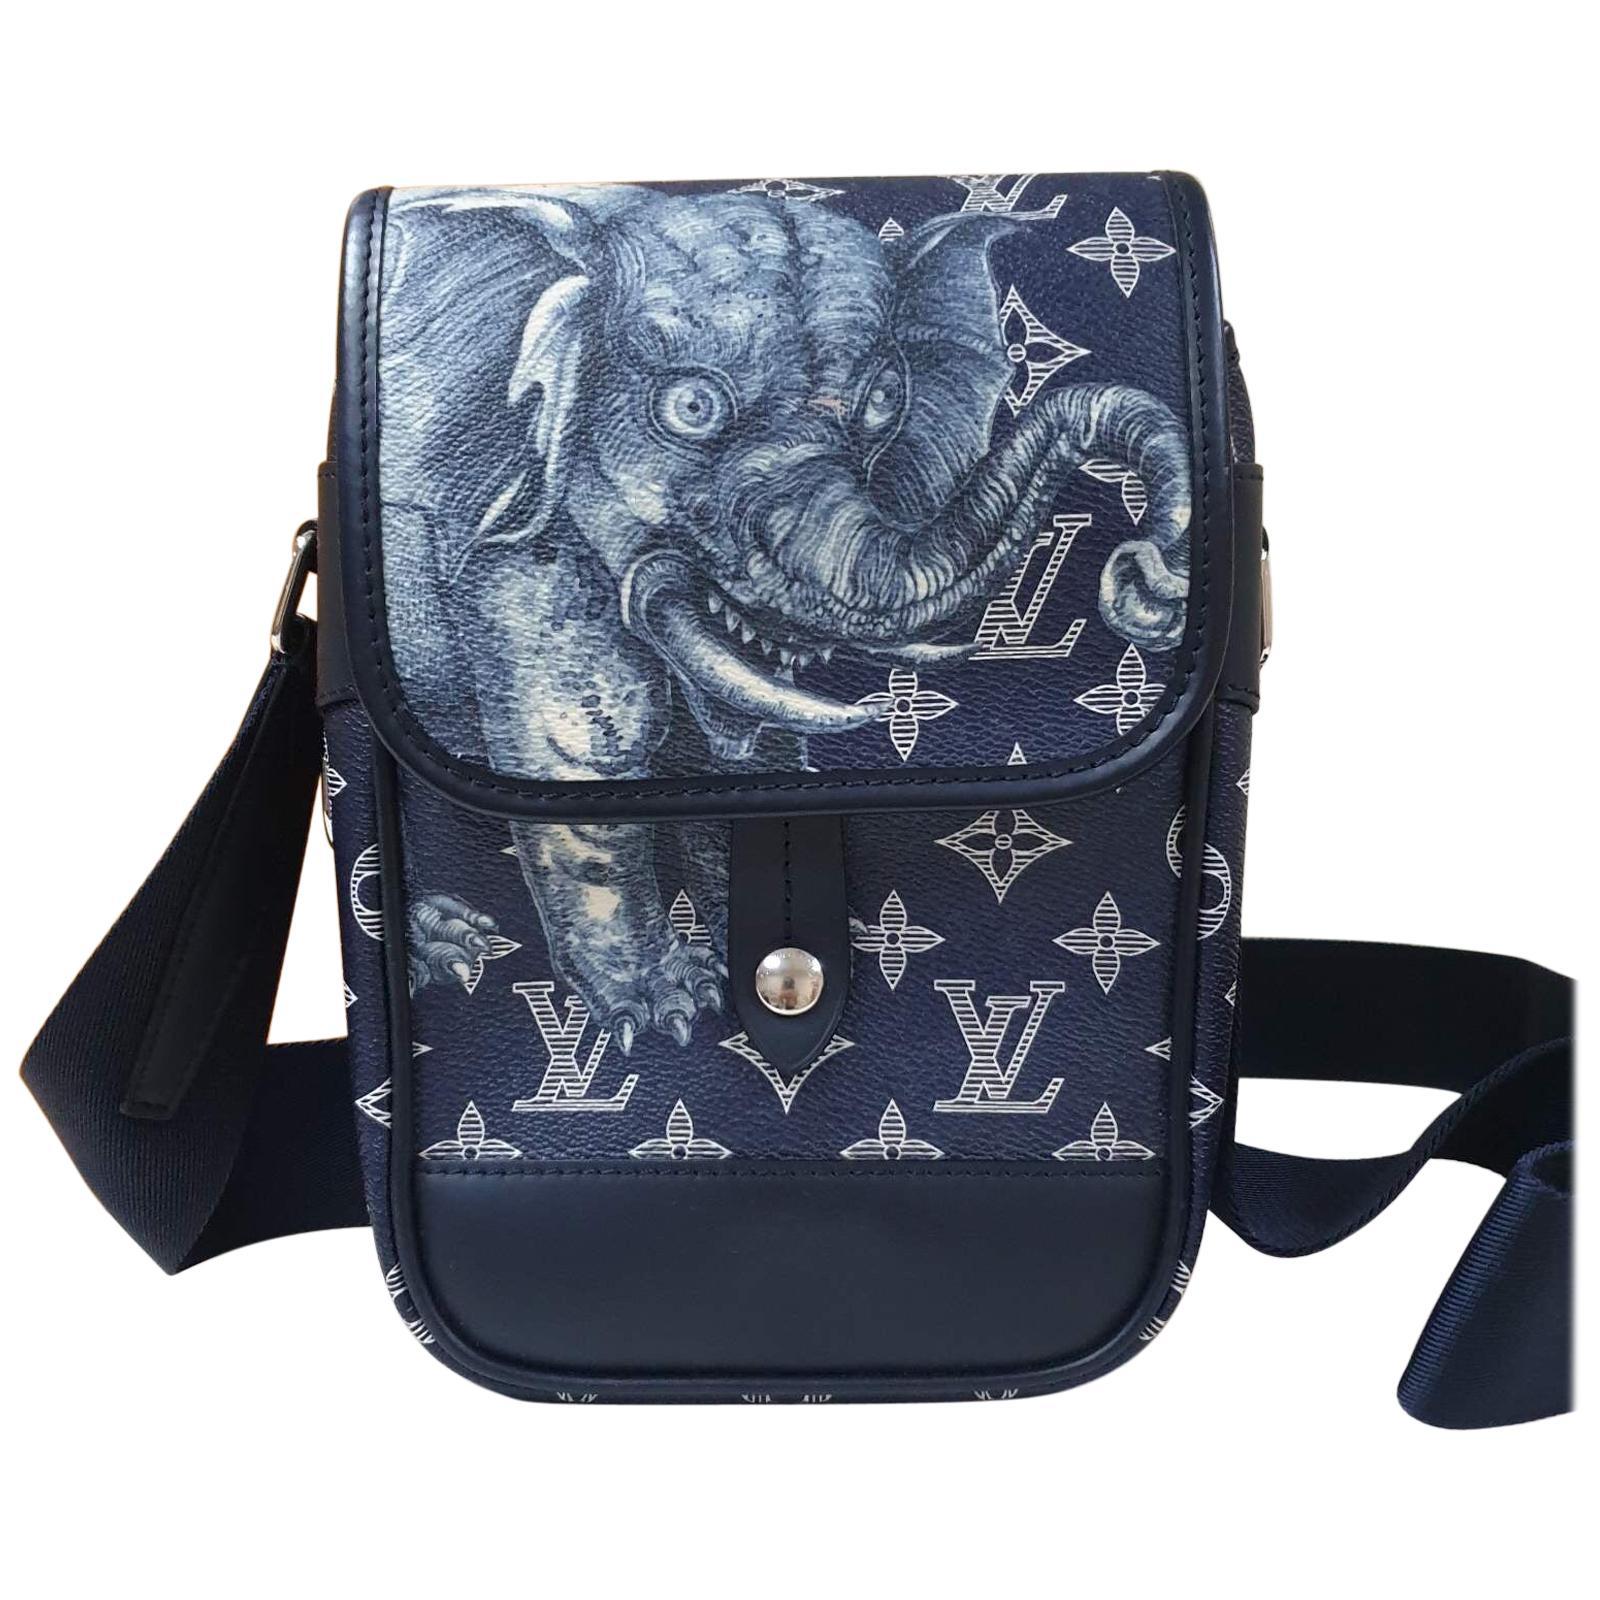 Louis Vuitton  Monogram Savanna Elephant Chapman Brothers Shoulder Bag